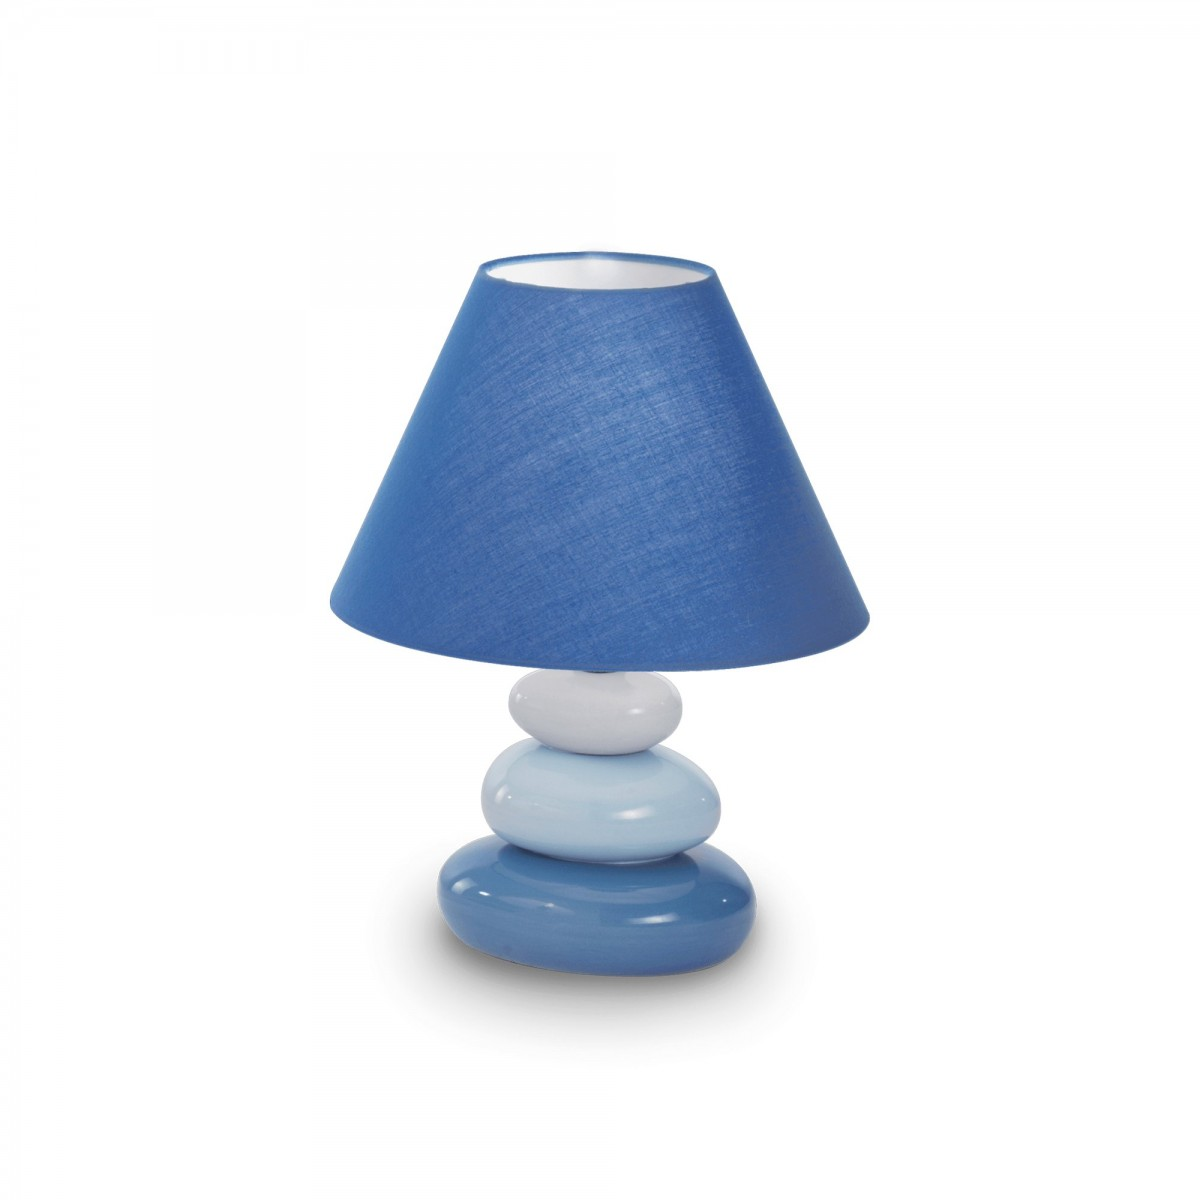 stolní lampa Ideal lux K2 TL1 035031 1x40W E14 - designová keramika